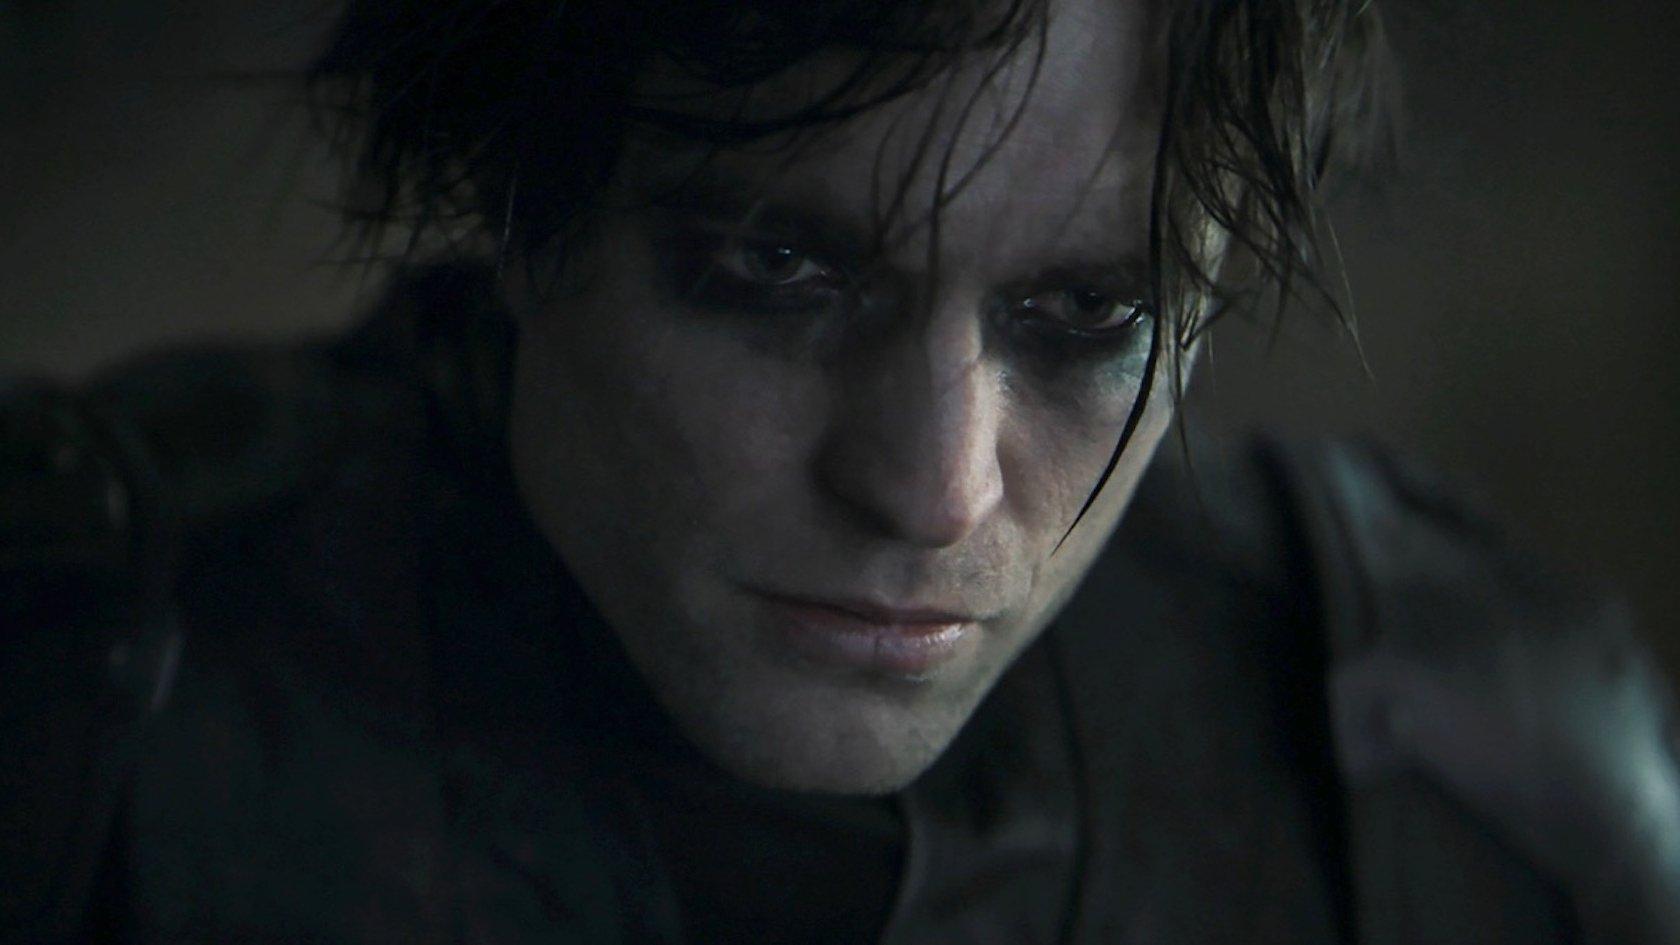 Robert Pattinson Has Gotten Too Fat To Play Batman?